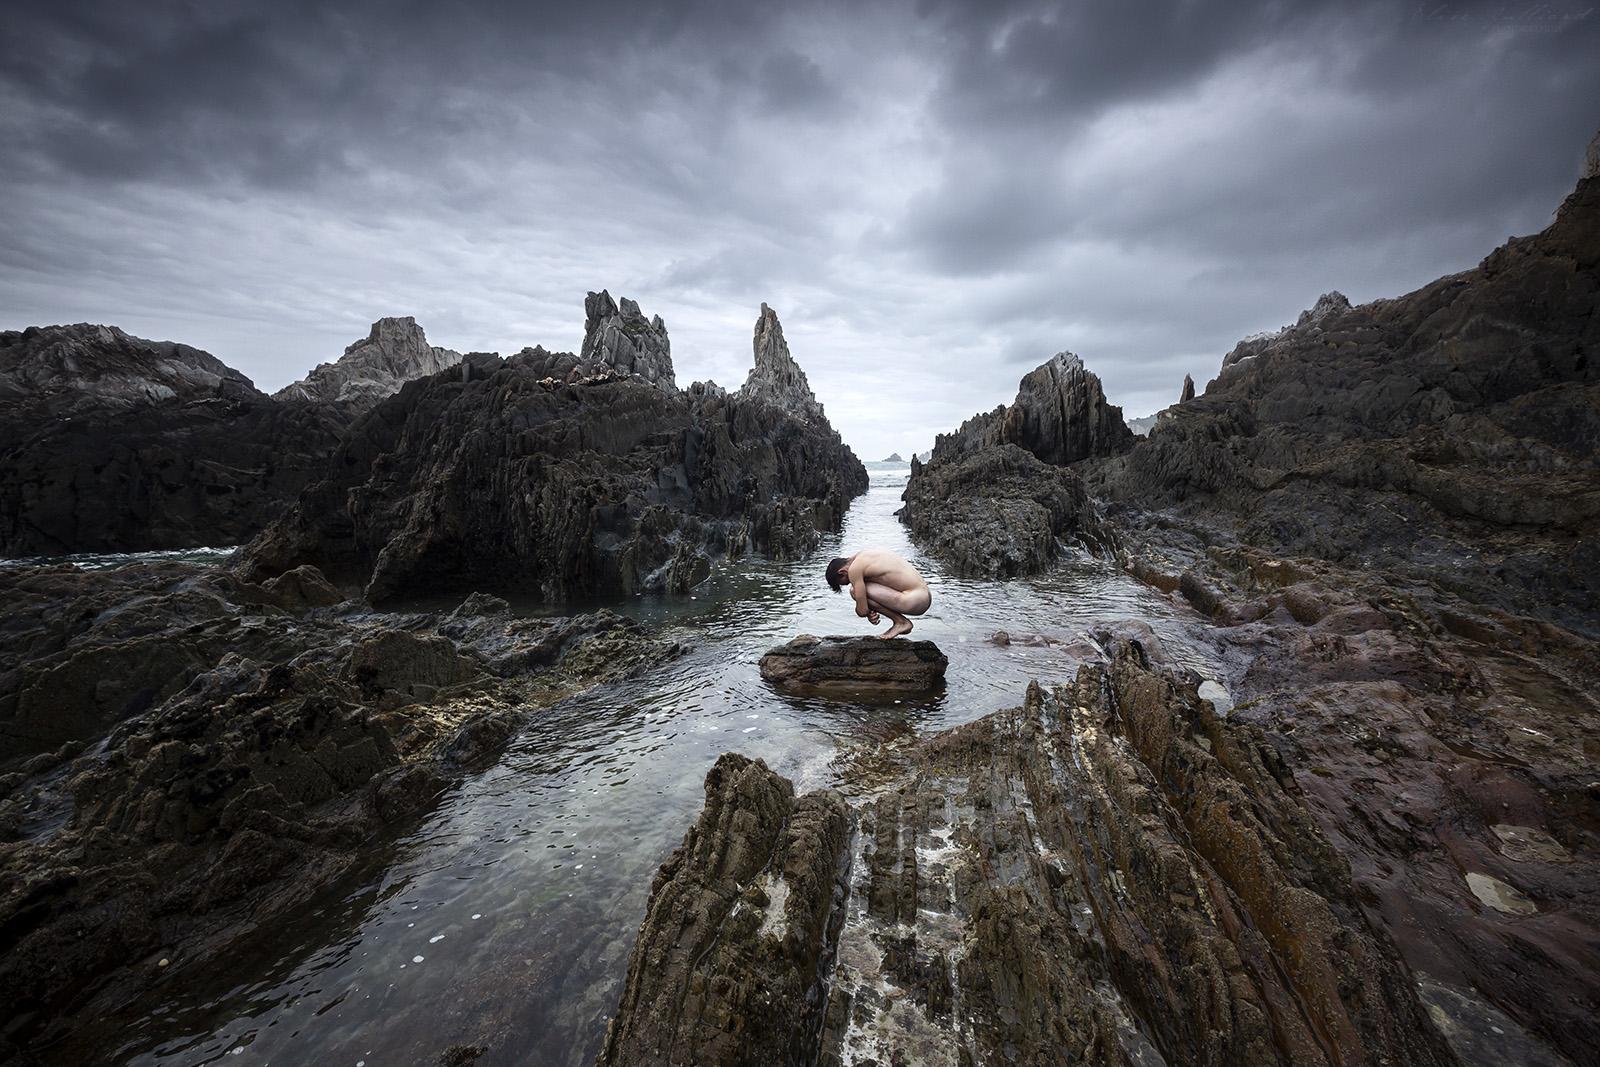 espagne-spain-europe-voyage-paysage-portrait-landscape-playa-plage-gueirua-asturies-asturias-espagna-photographe-photographer-lyon